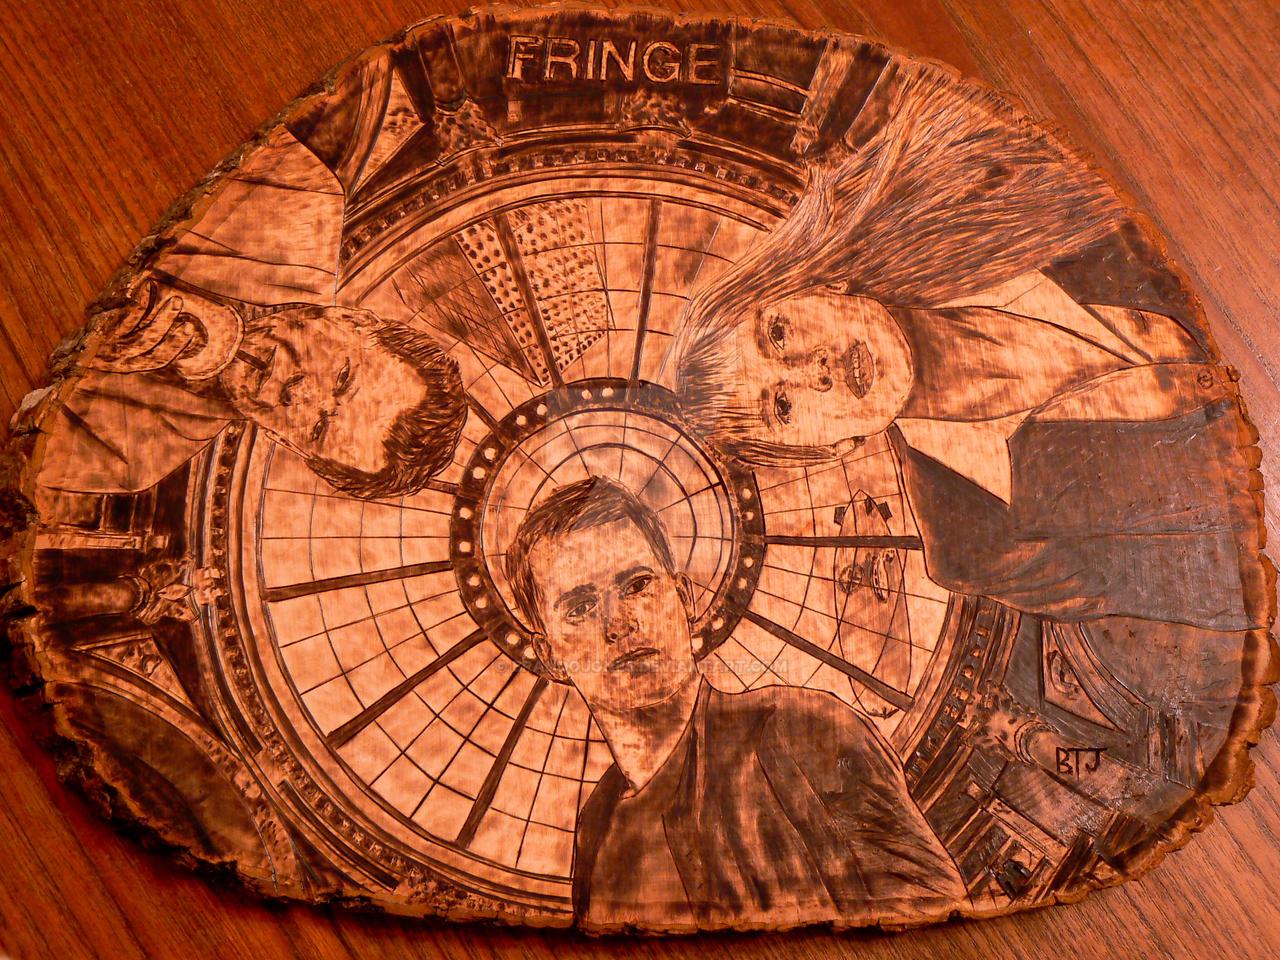 ... Fringe   Wood Burning (pyrography Art) By Brandojones